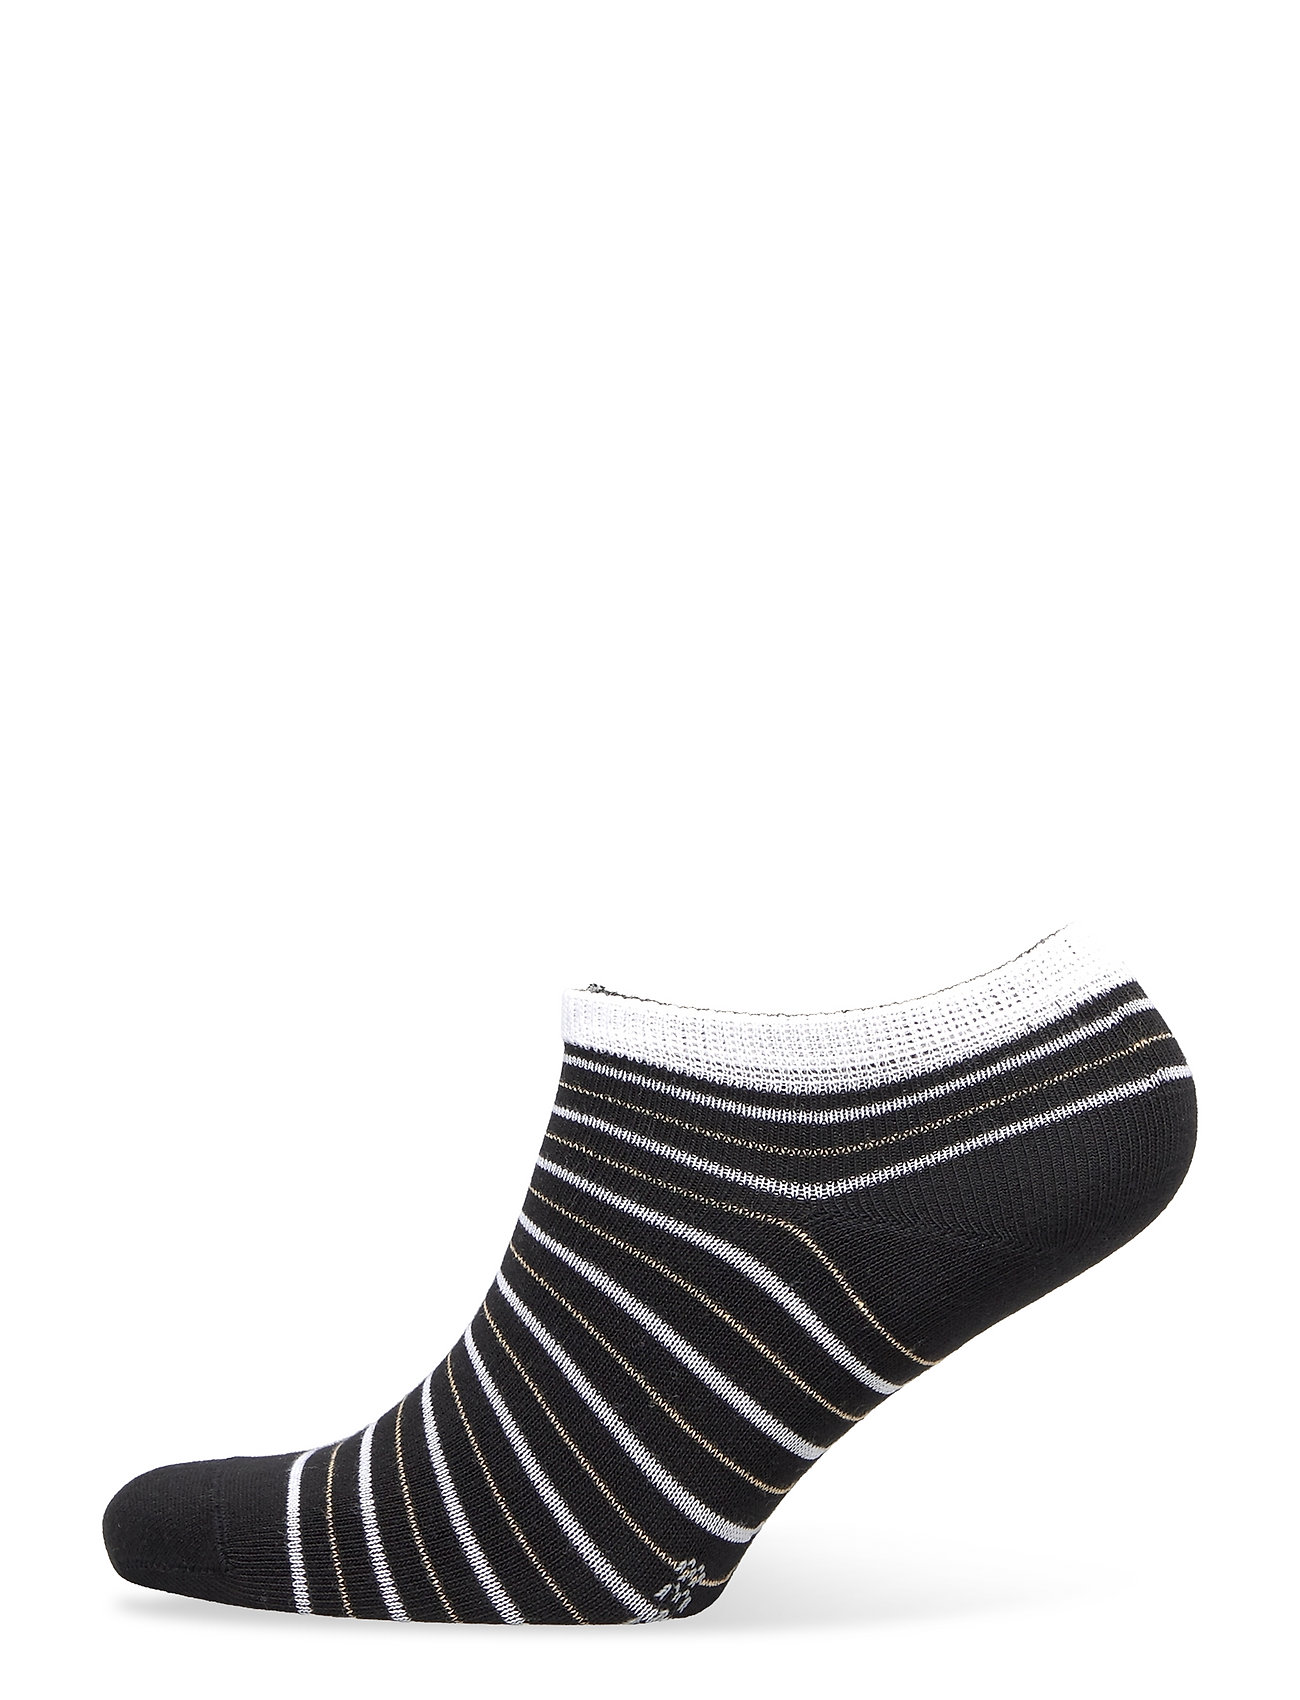 Falke Stripe Shimmer Sn Lingerie Socks Footies/Ankle Socks Sort Falke Women